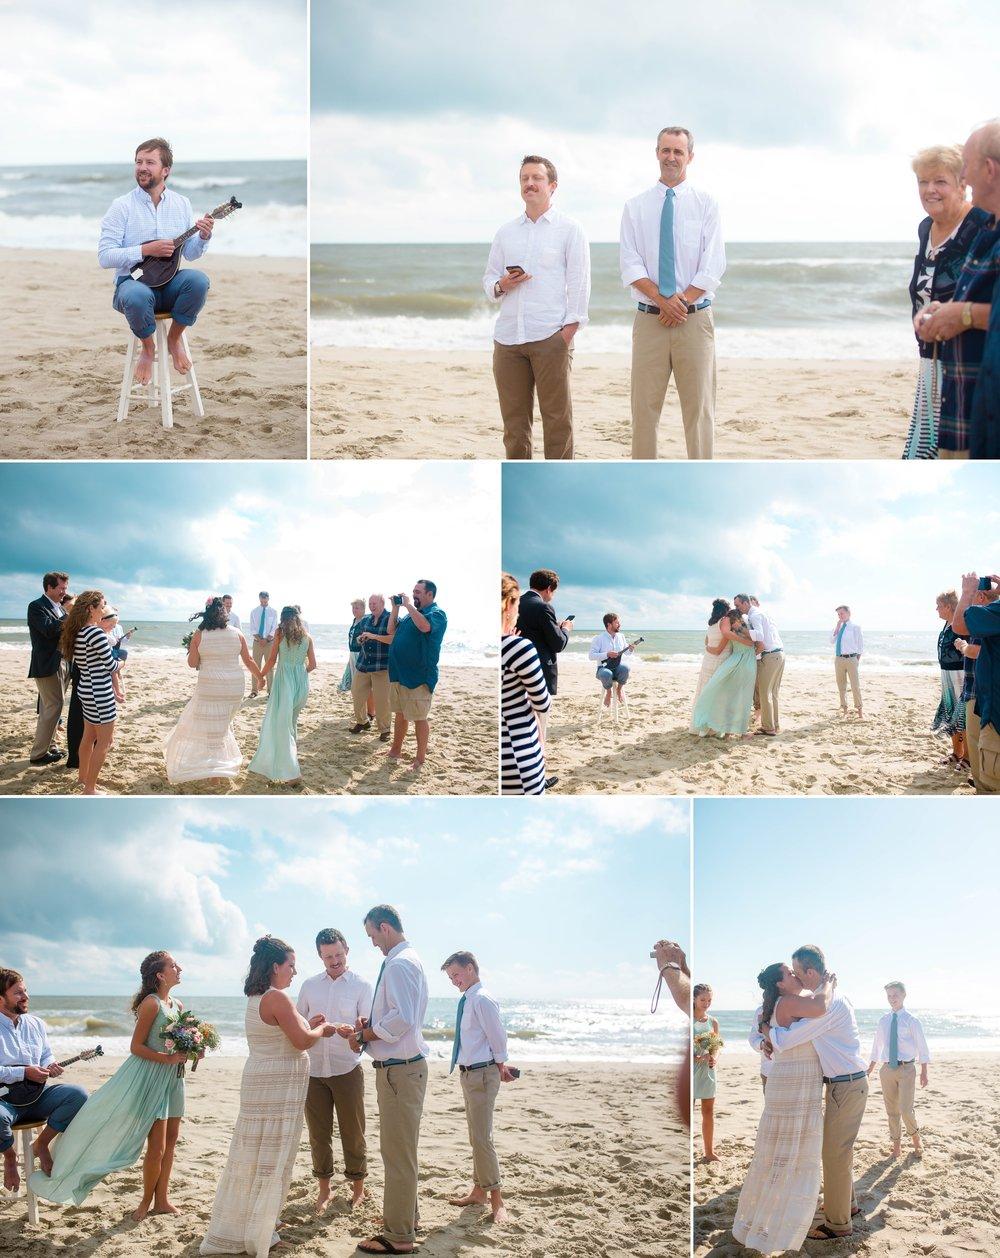 Chris + Sharon - Beach Wedding Photographer in Oak Island North Carolina